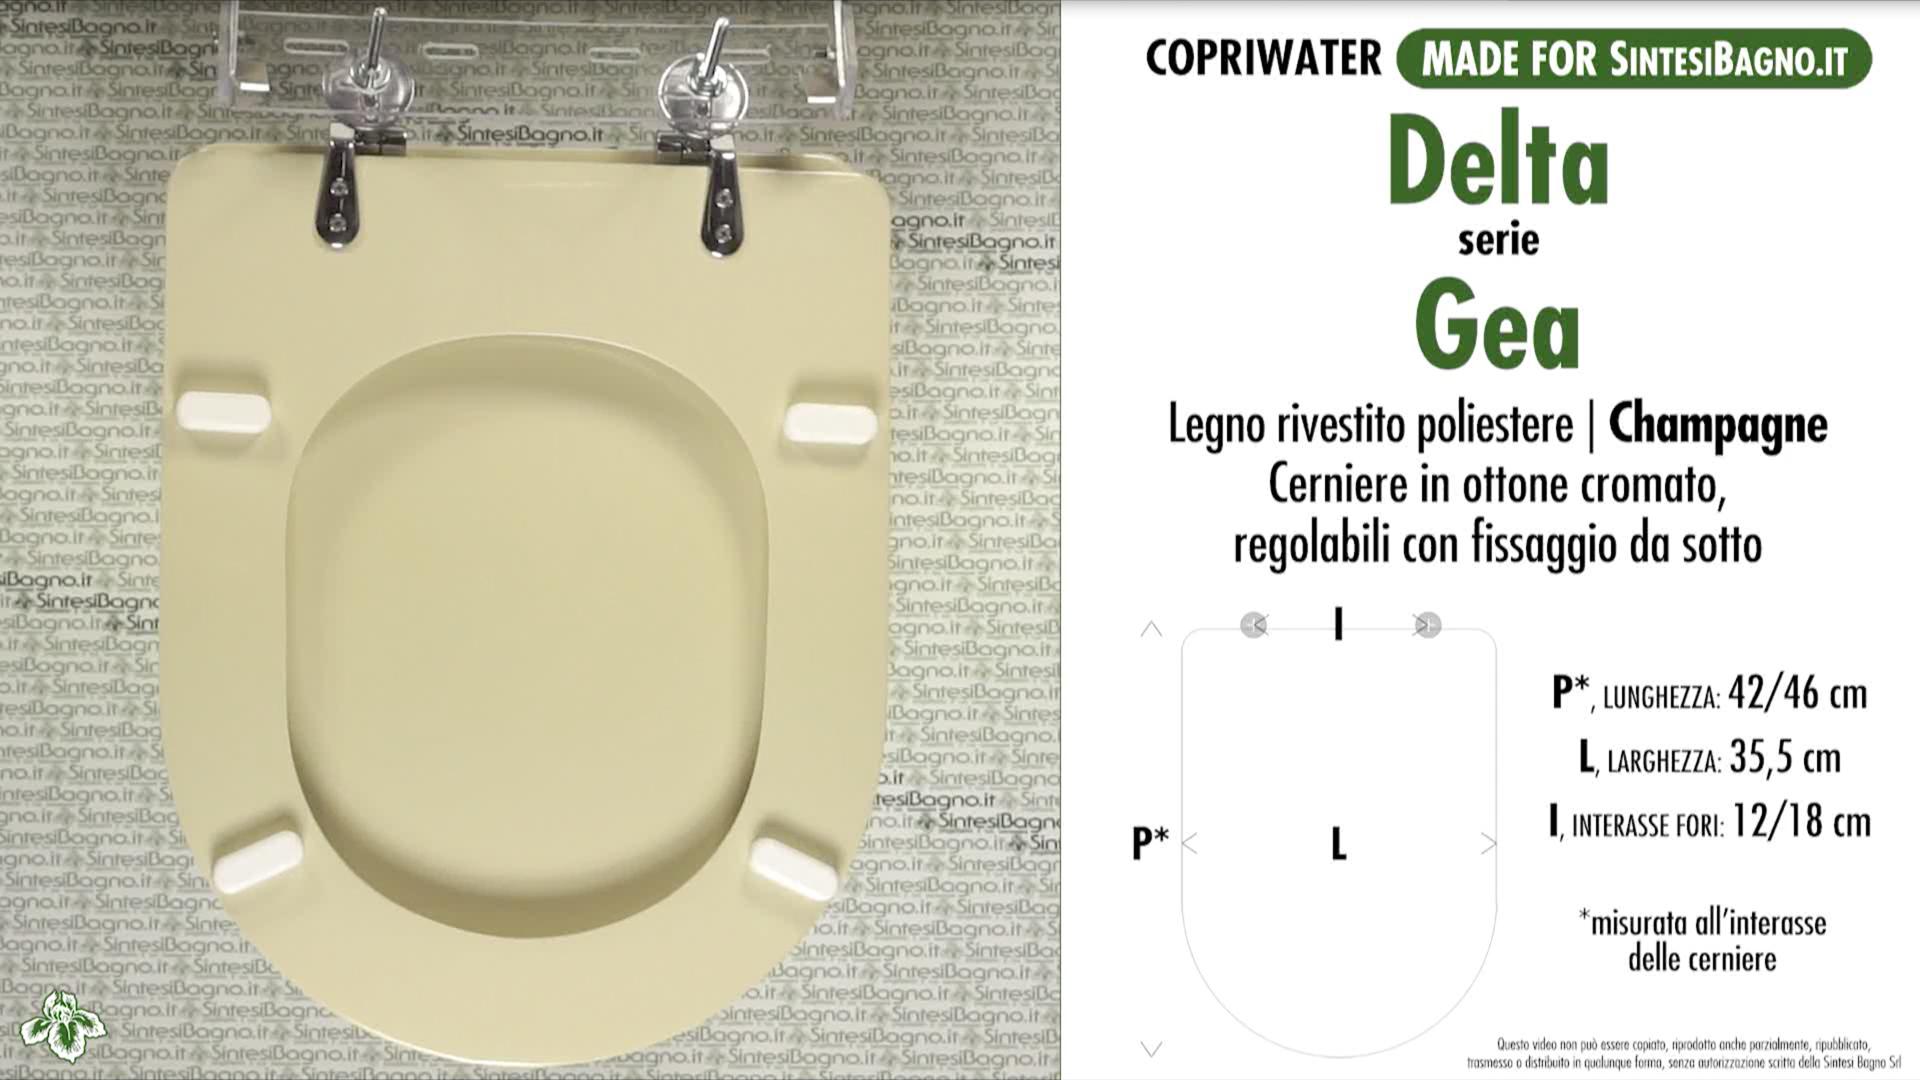 scheda-tecnica-datasheet-copriwater-delta-serie-gea-champagne